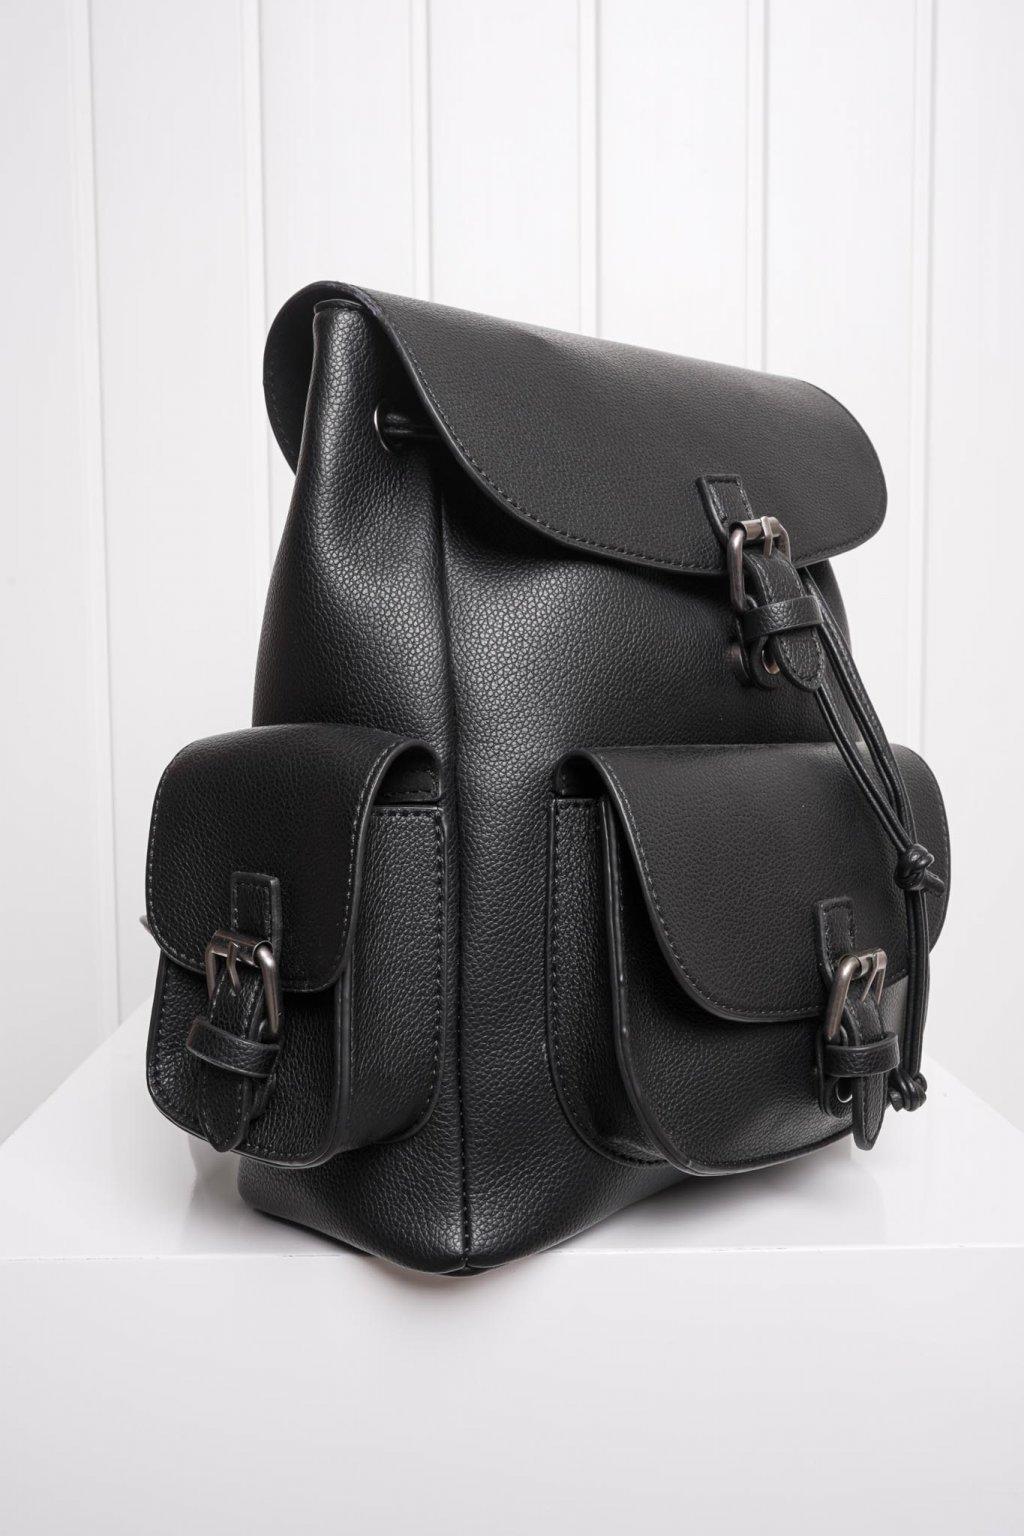 Kabelka, ruksak, dobrá cena, čierna kabelka, čierny ruksak, basic, kabelky, ruksaky 02